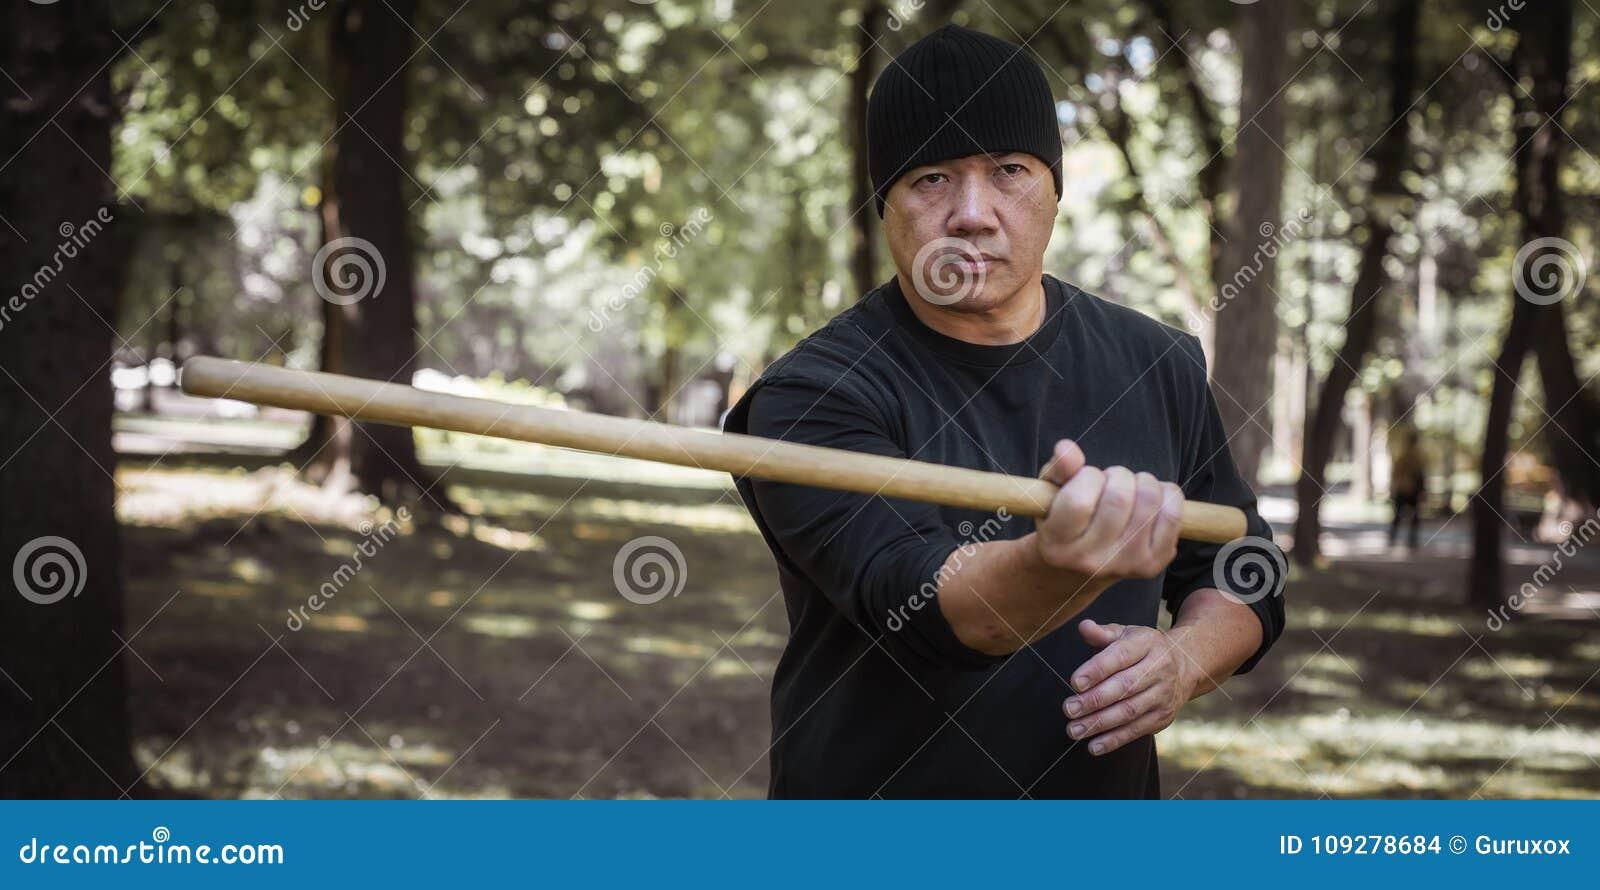 Filipino Martial Arts Instructor Demonstrates Stick Fighting